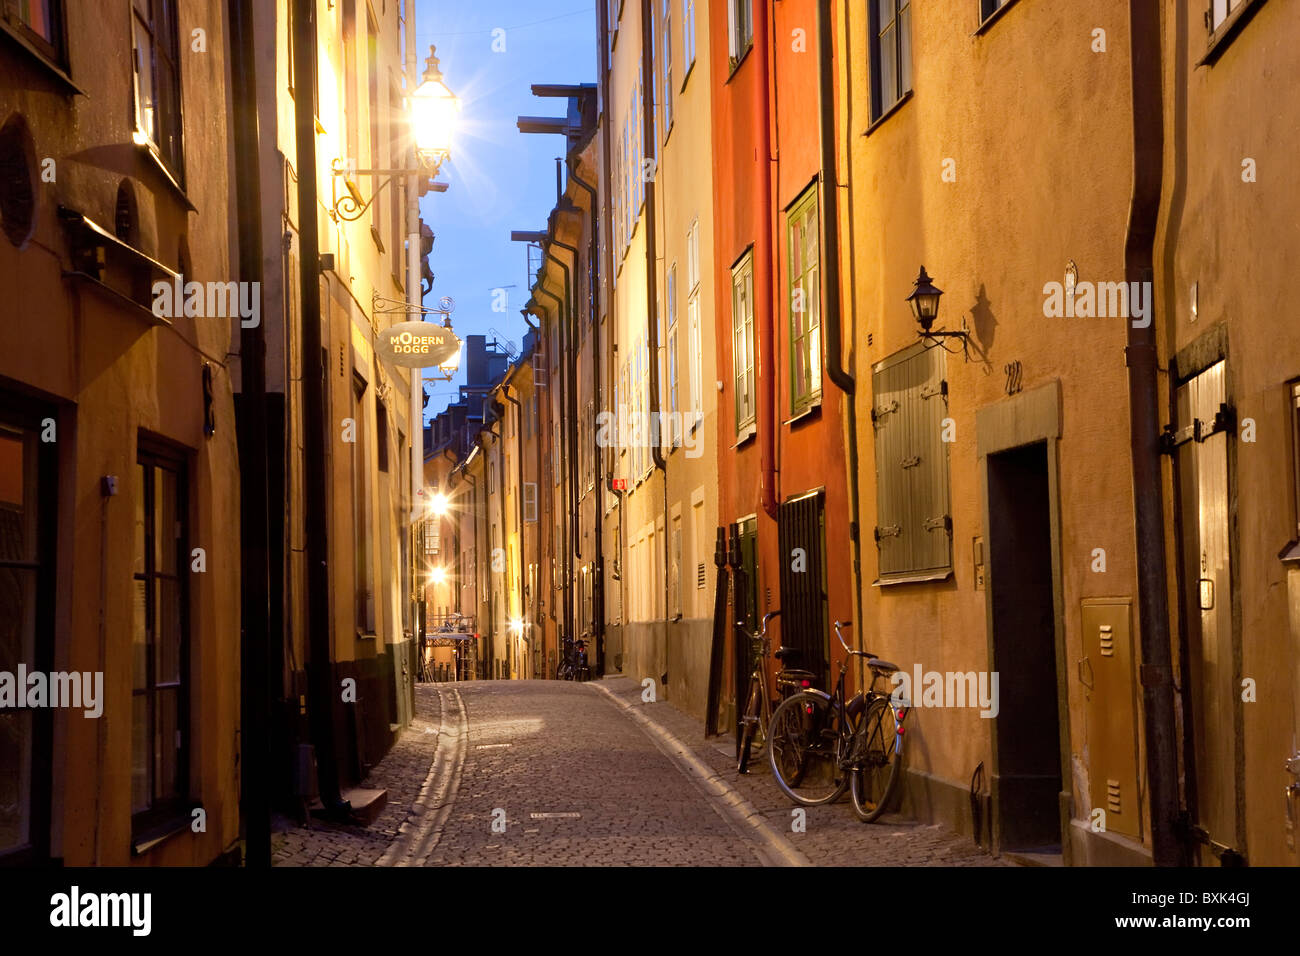 Historische alte Straße in der Altstadt Gamla Stan in Stockholm Schweden Stockbild